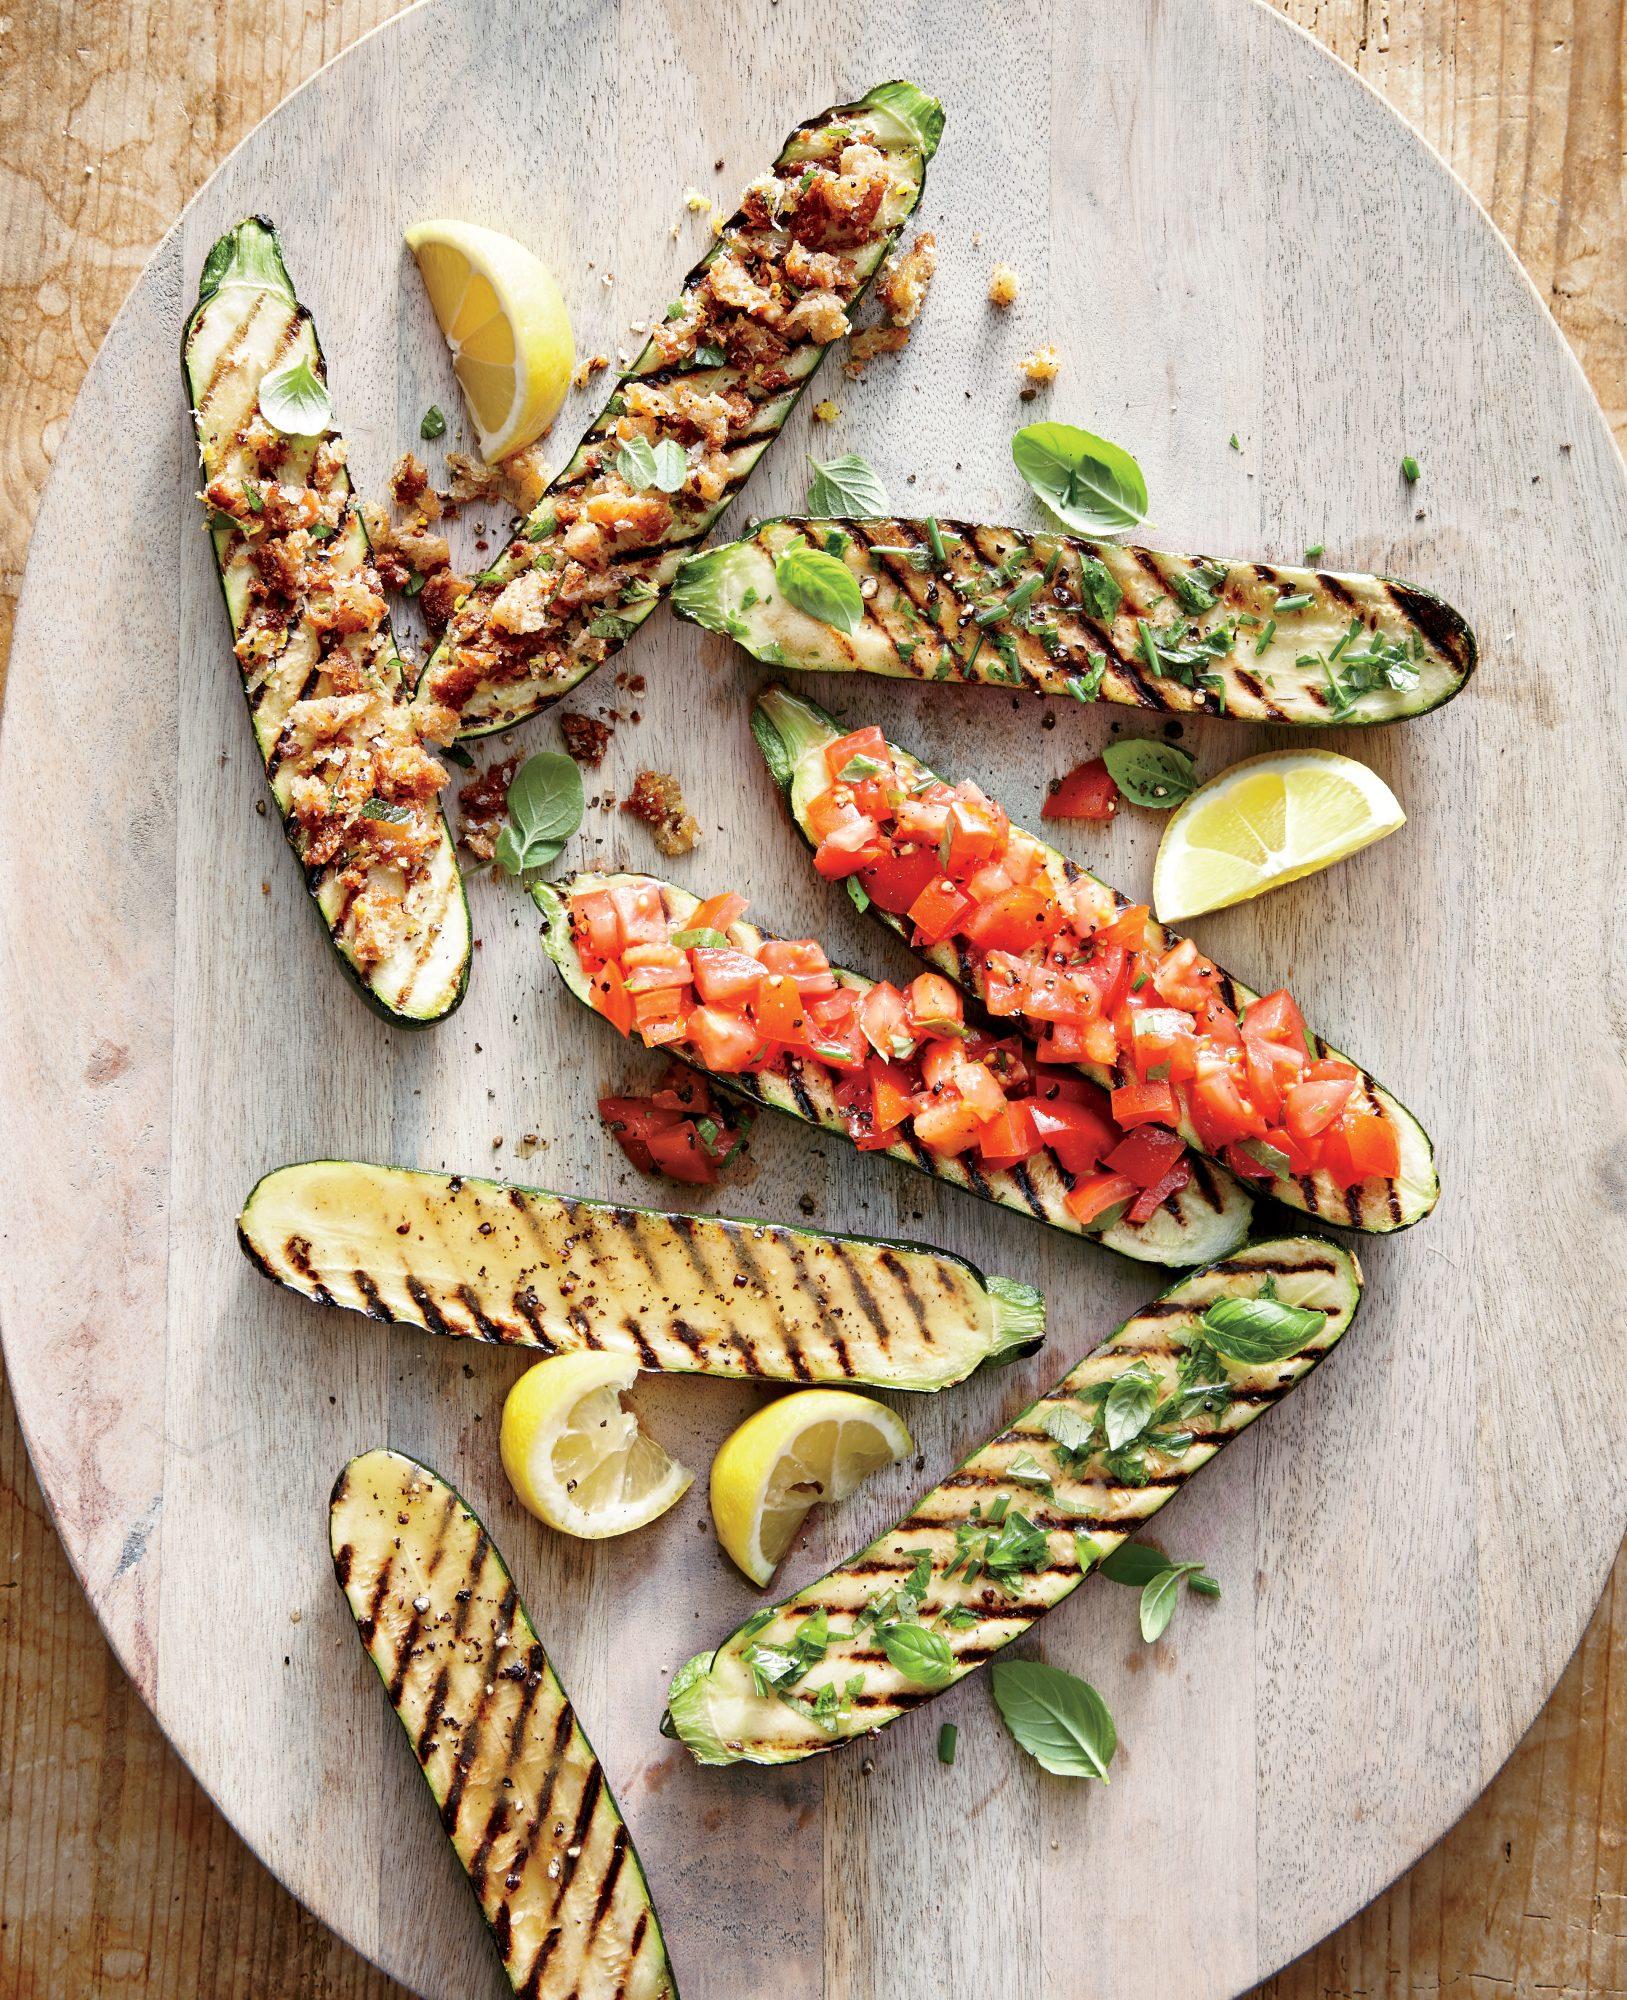 Grilled Zucchini with Lemon-Garlic Breadcrumbs